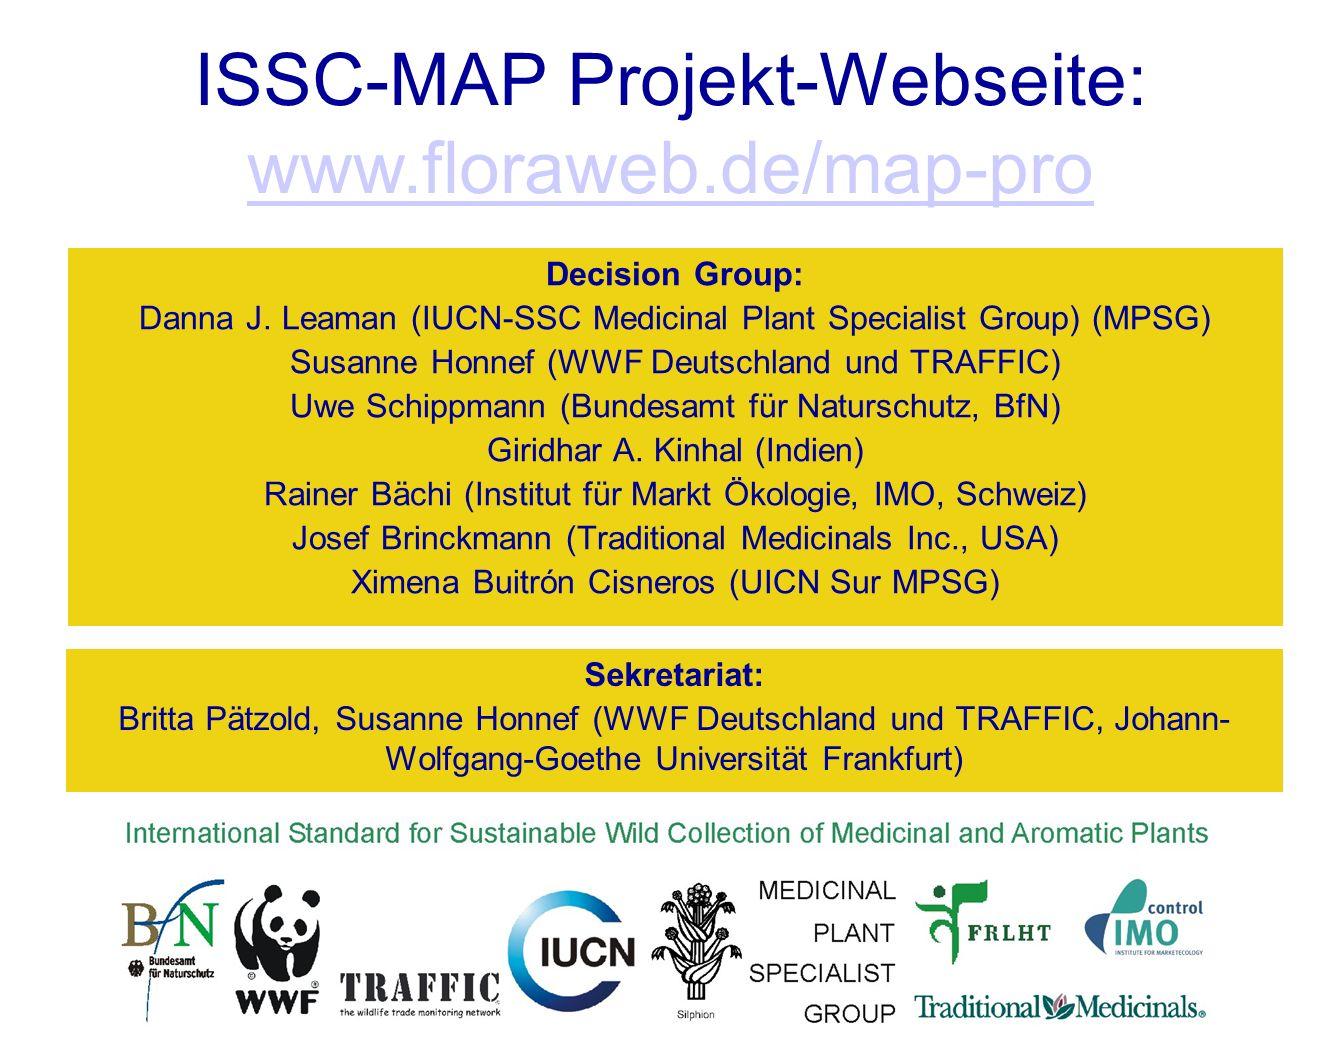 ISSC-MAP Projekt-Webseite: www.floraweb.de/map-pro www.floraweb.de/map-pro Decision Group: Danna J. Leaman (IUCN-SSC Medicinal Plant Specialist Group)